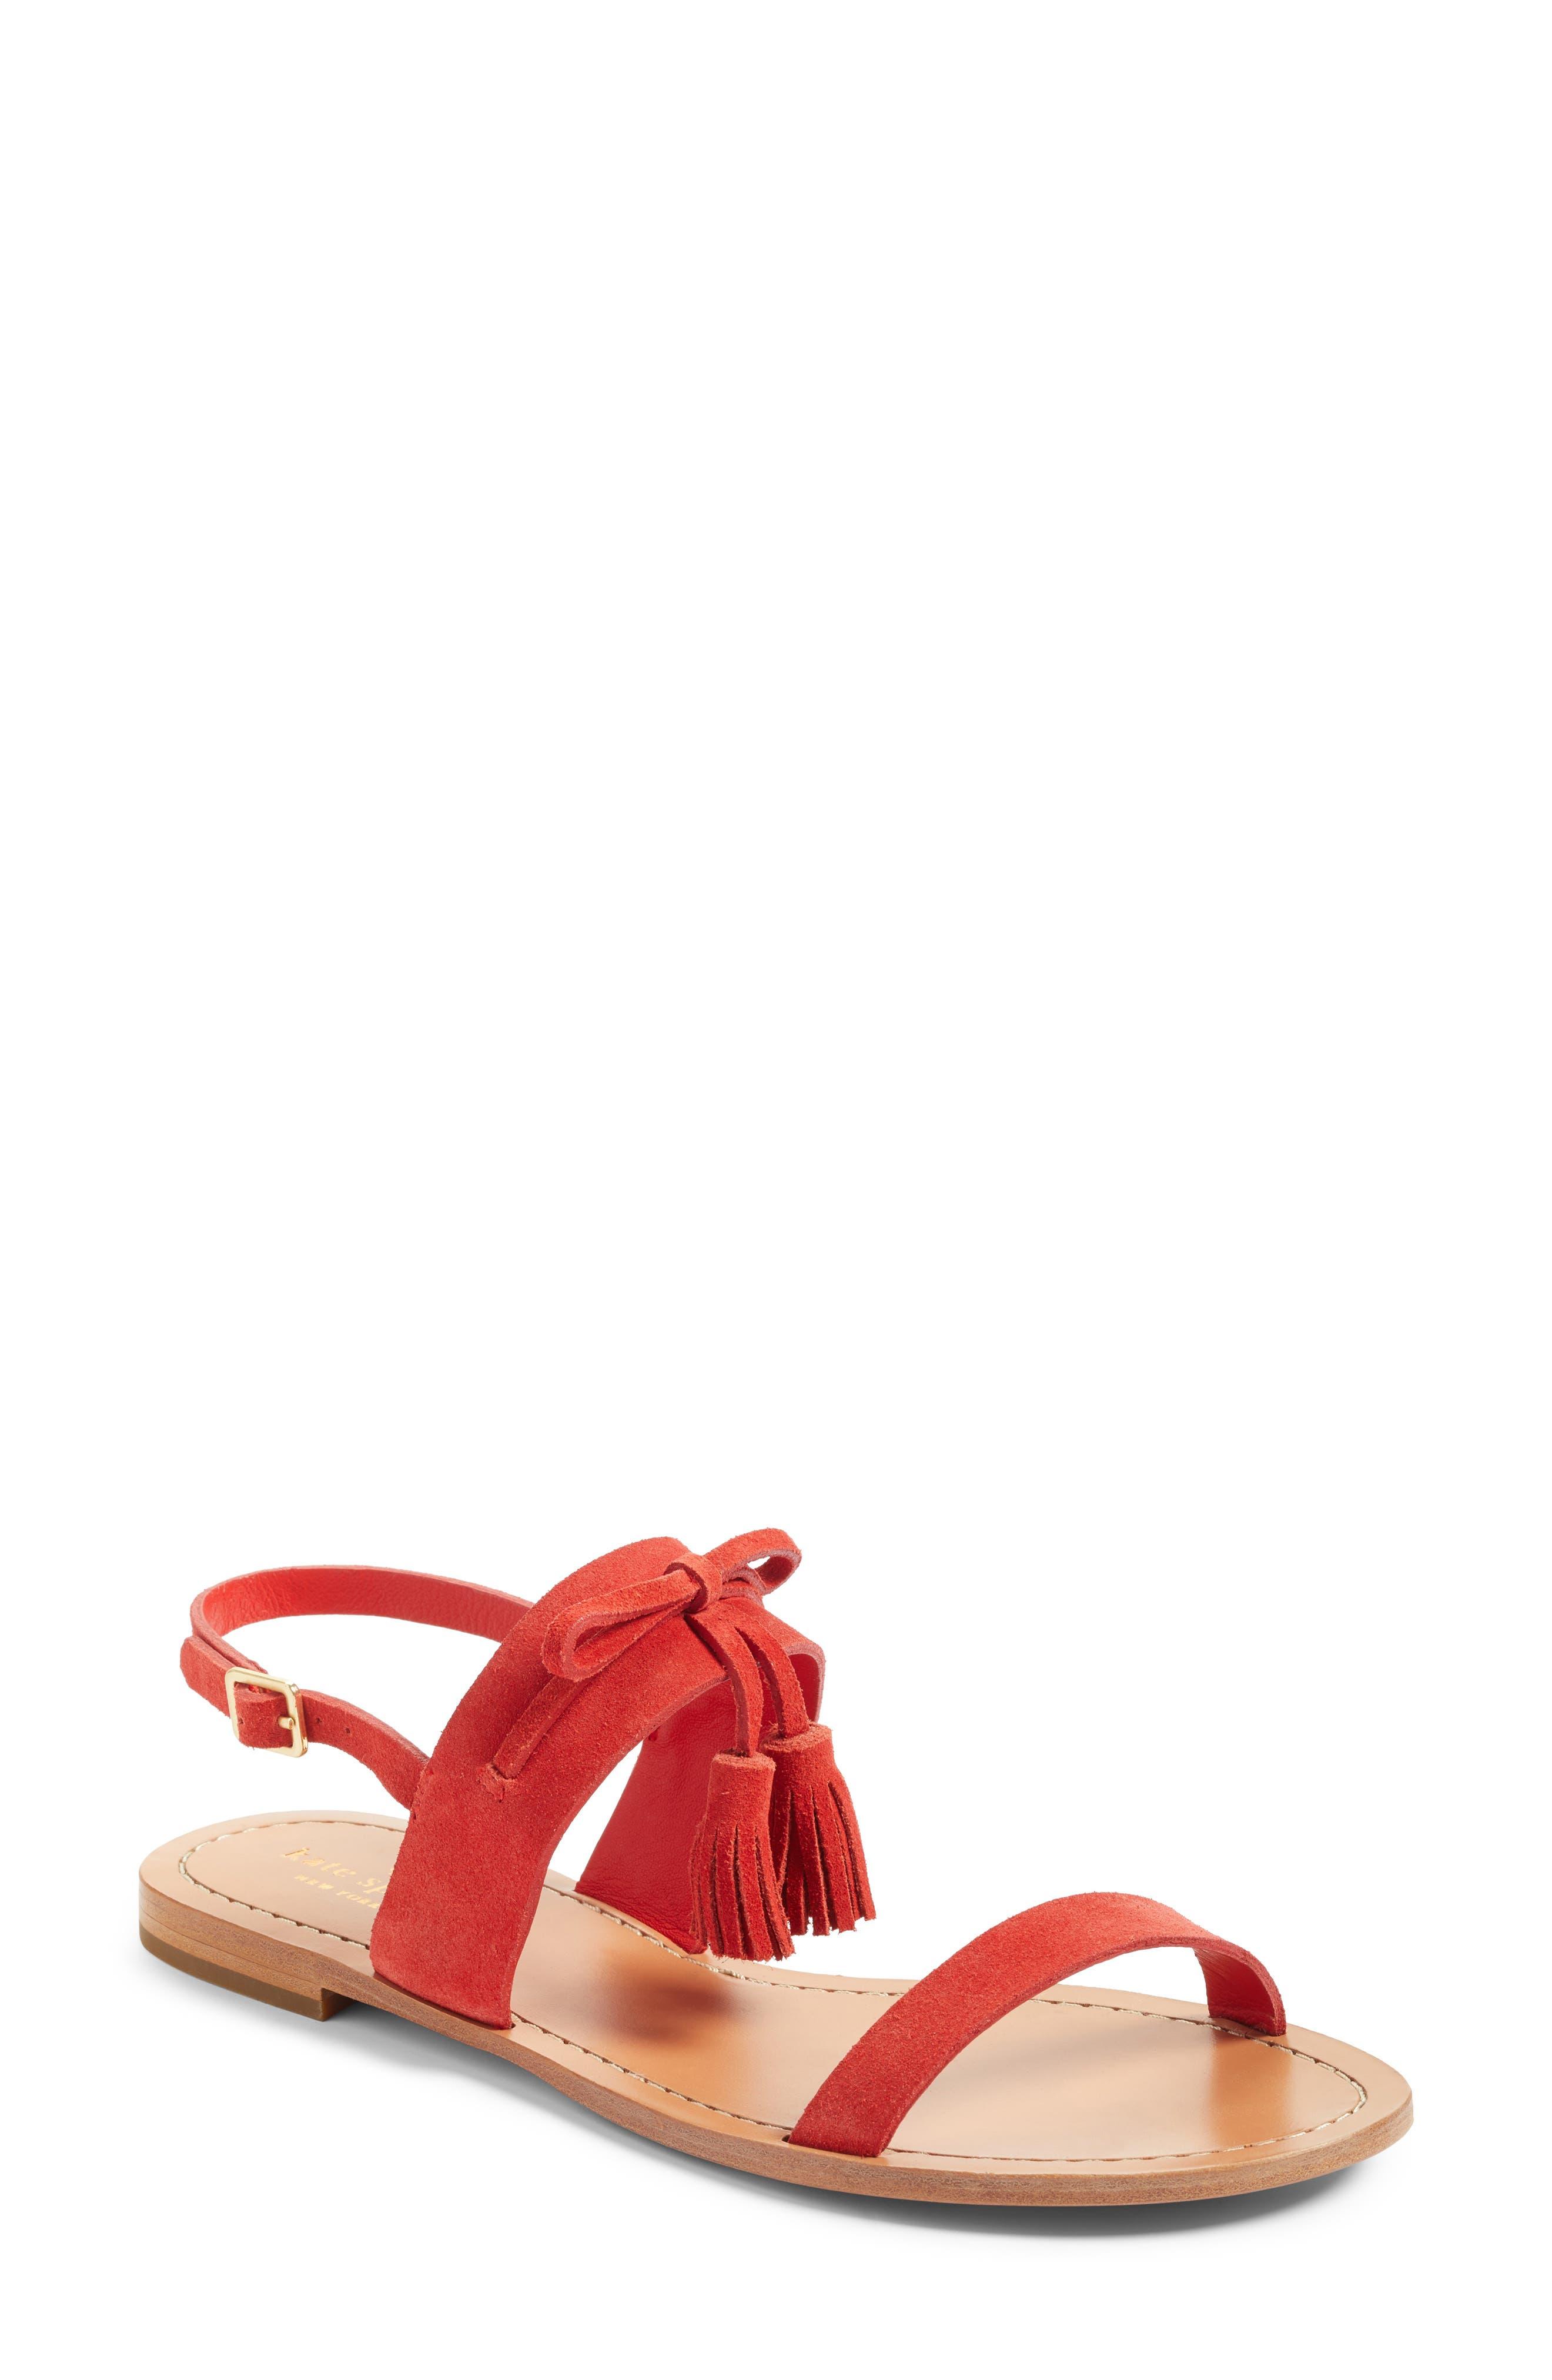 Main Image - kate spade new york carlita tassel sandal (Women)